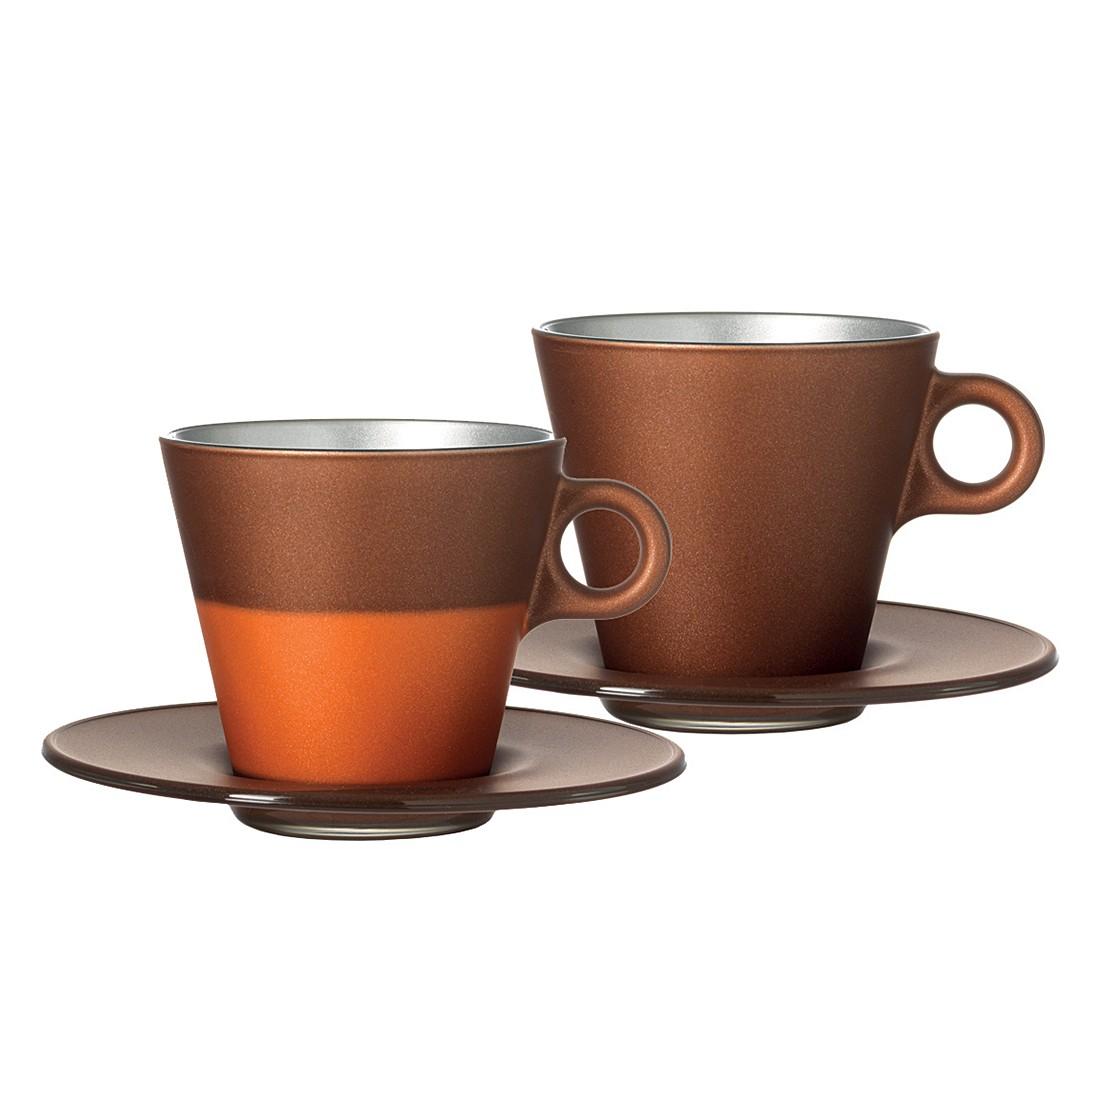 Cappuccinotasse Ooh Magico (2er-Set) – Braun Metallic, Leonardo günstig online kaufen